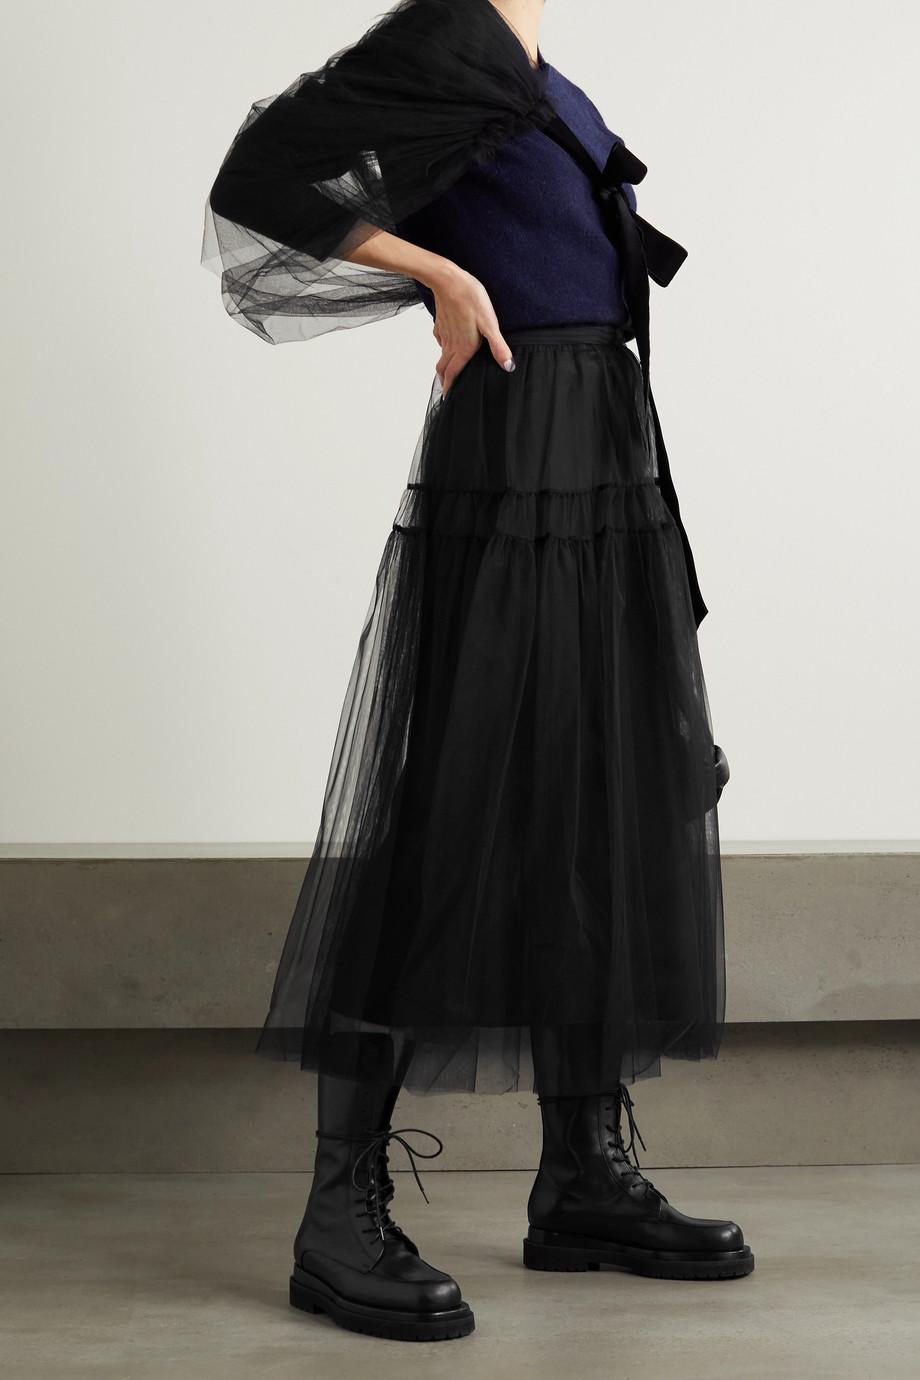 Molly Goddard Lottie 层接式缩褶绢网中长半身裙